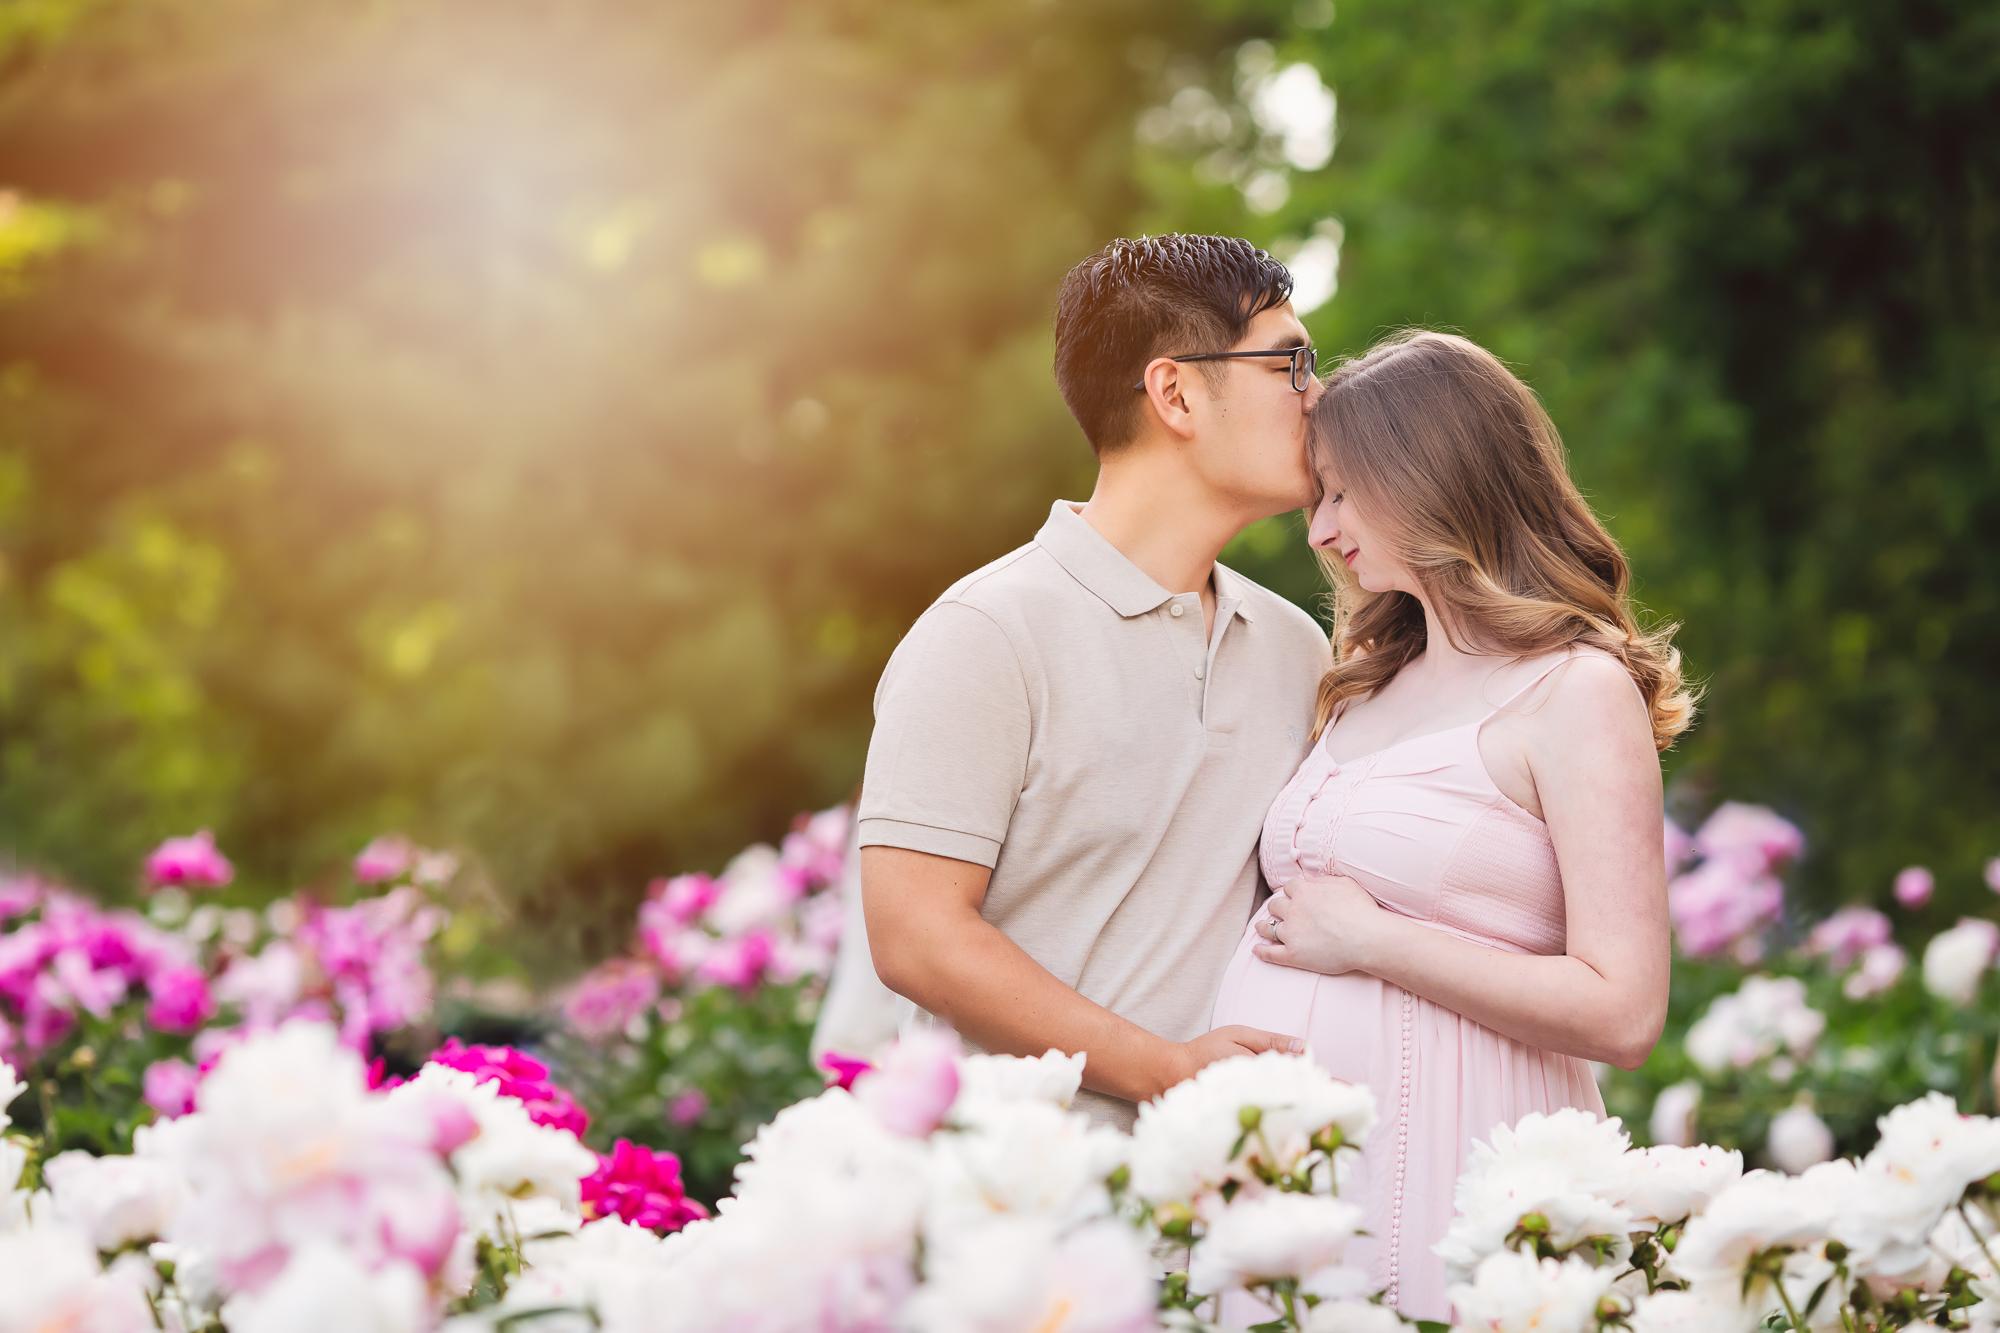 maternity photos in the peony gardens in Ann Arbor